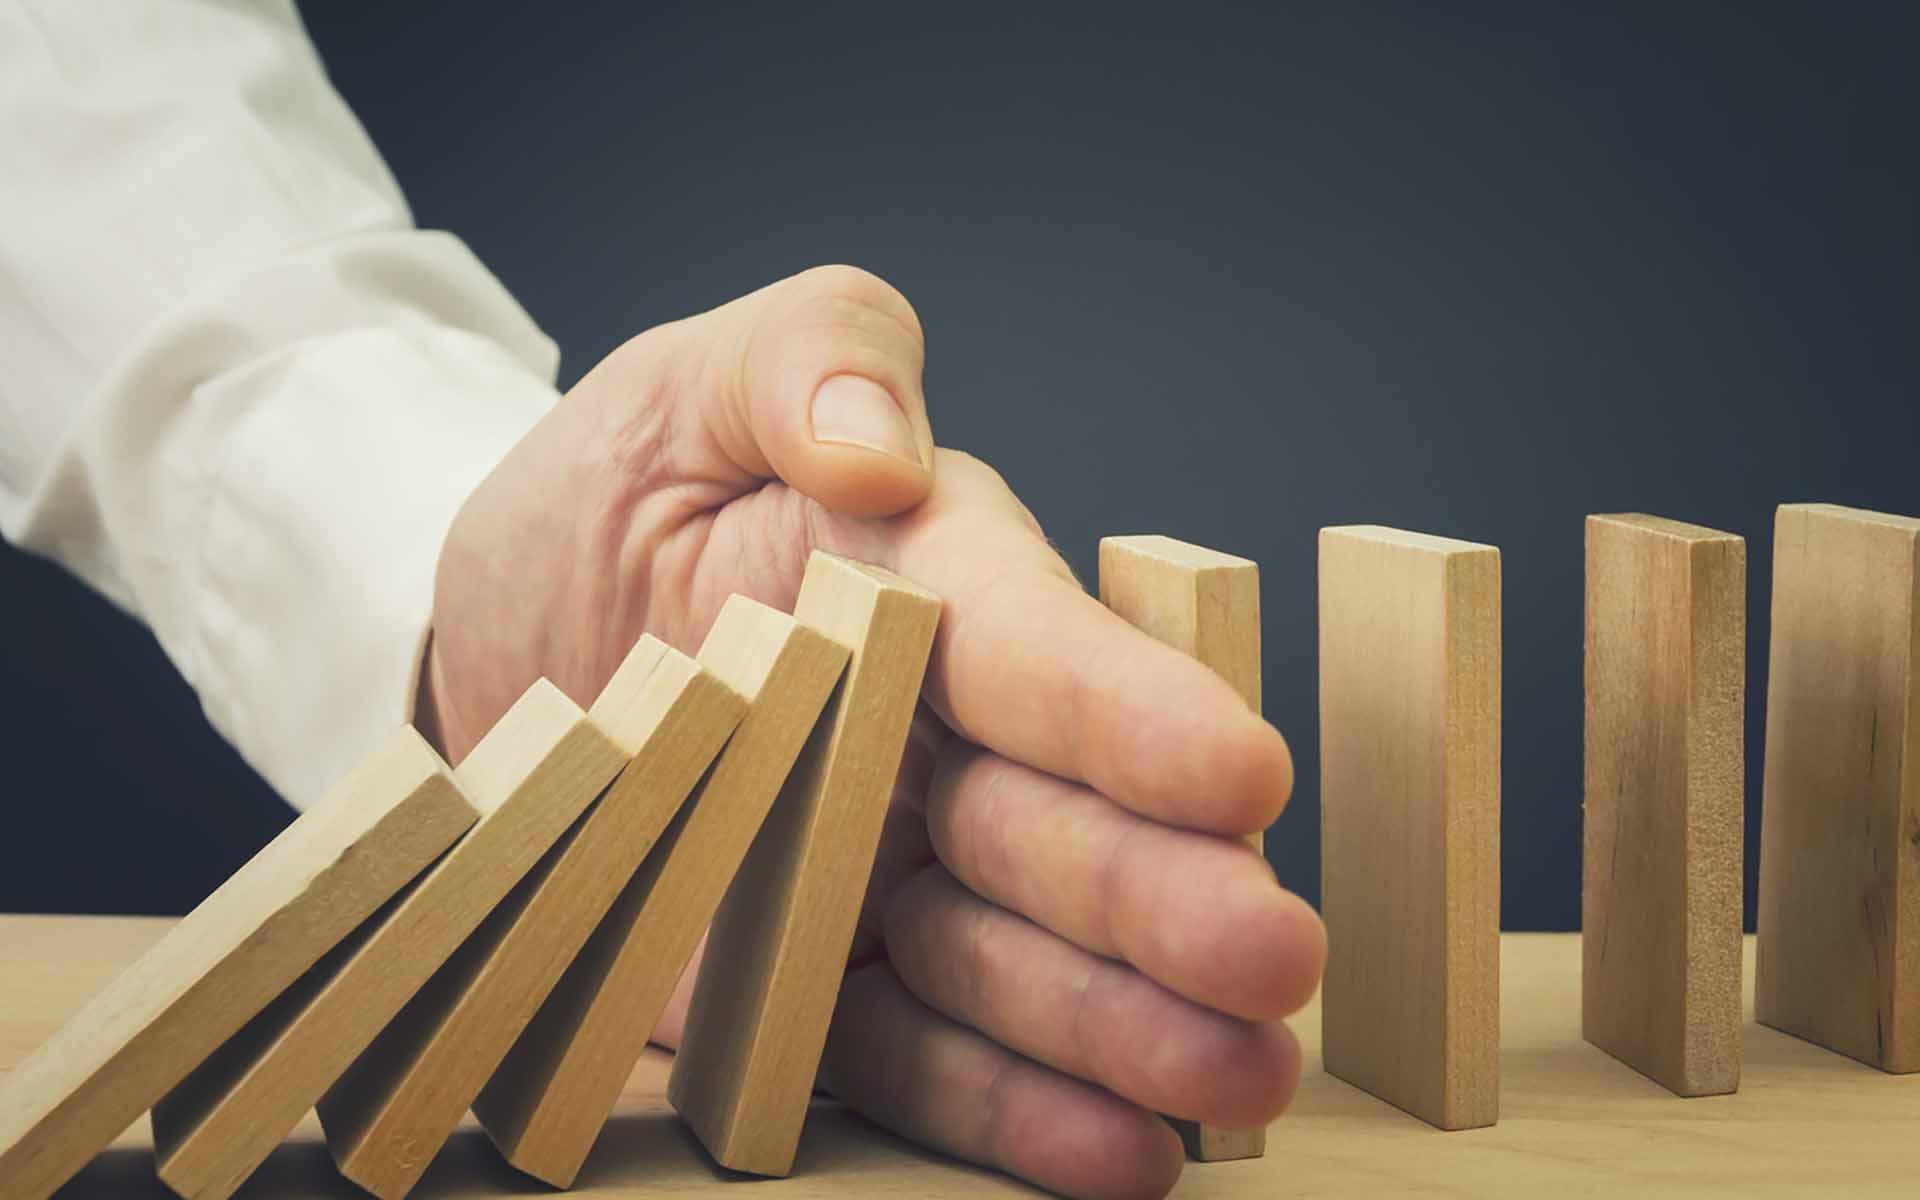 Vitalik Buterin proposes cap on max Ethereum's ETH supply